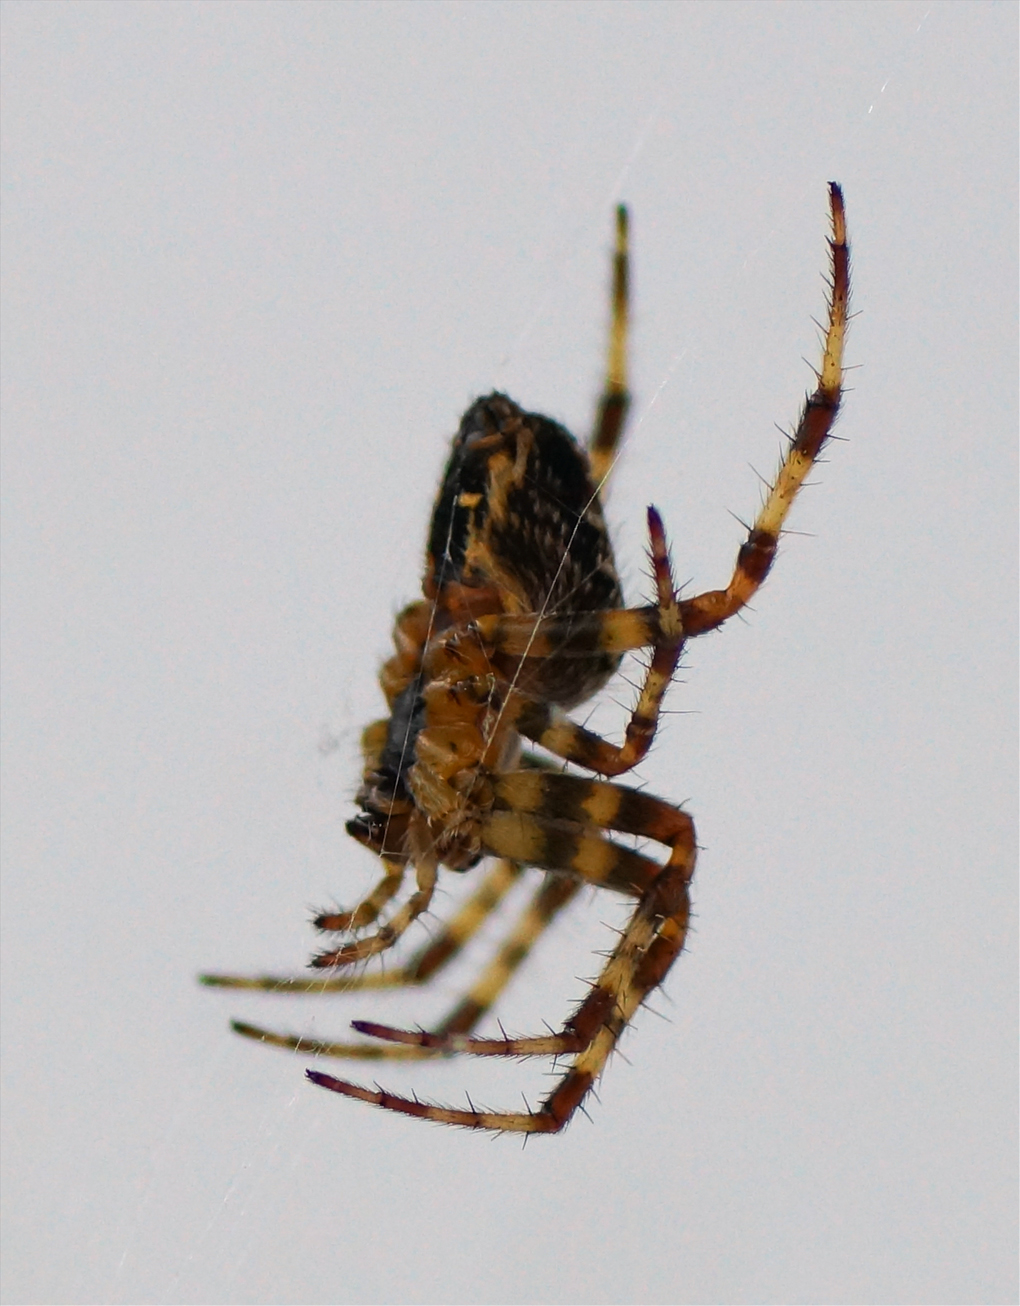 Korsedderkopp (Araneus diadematus)